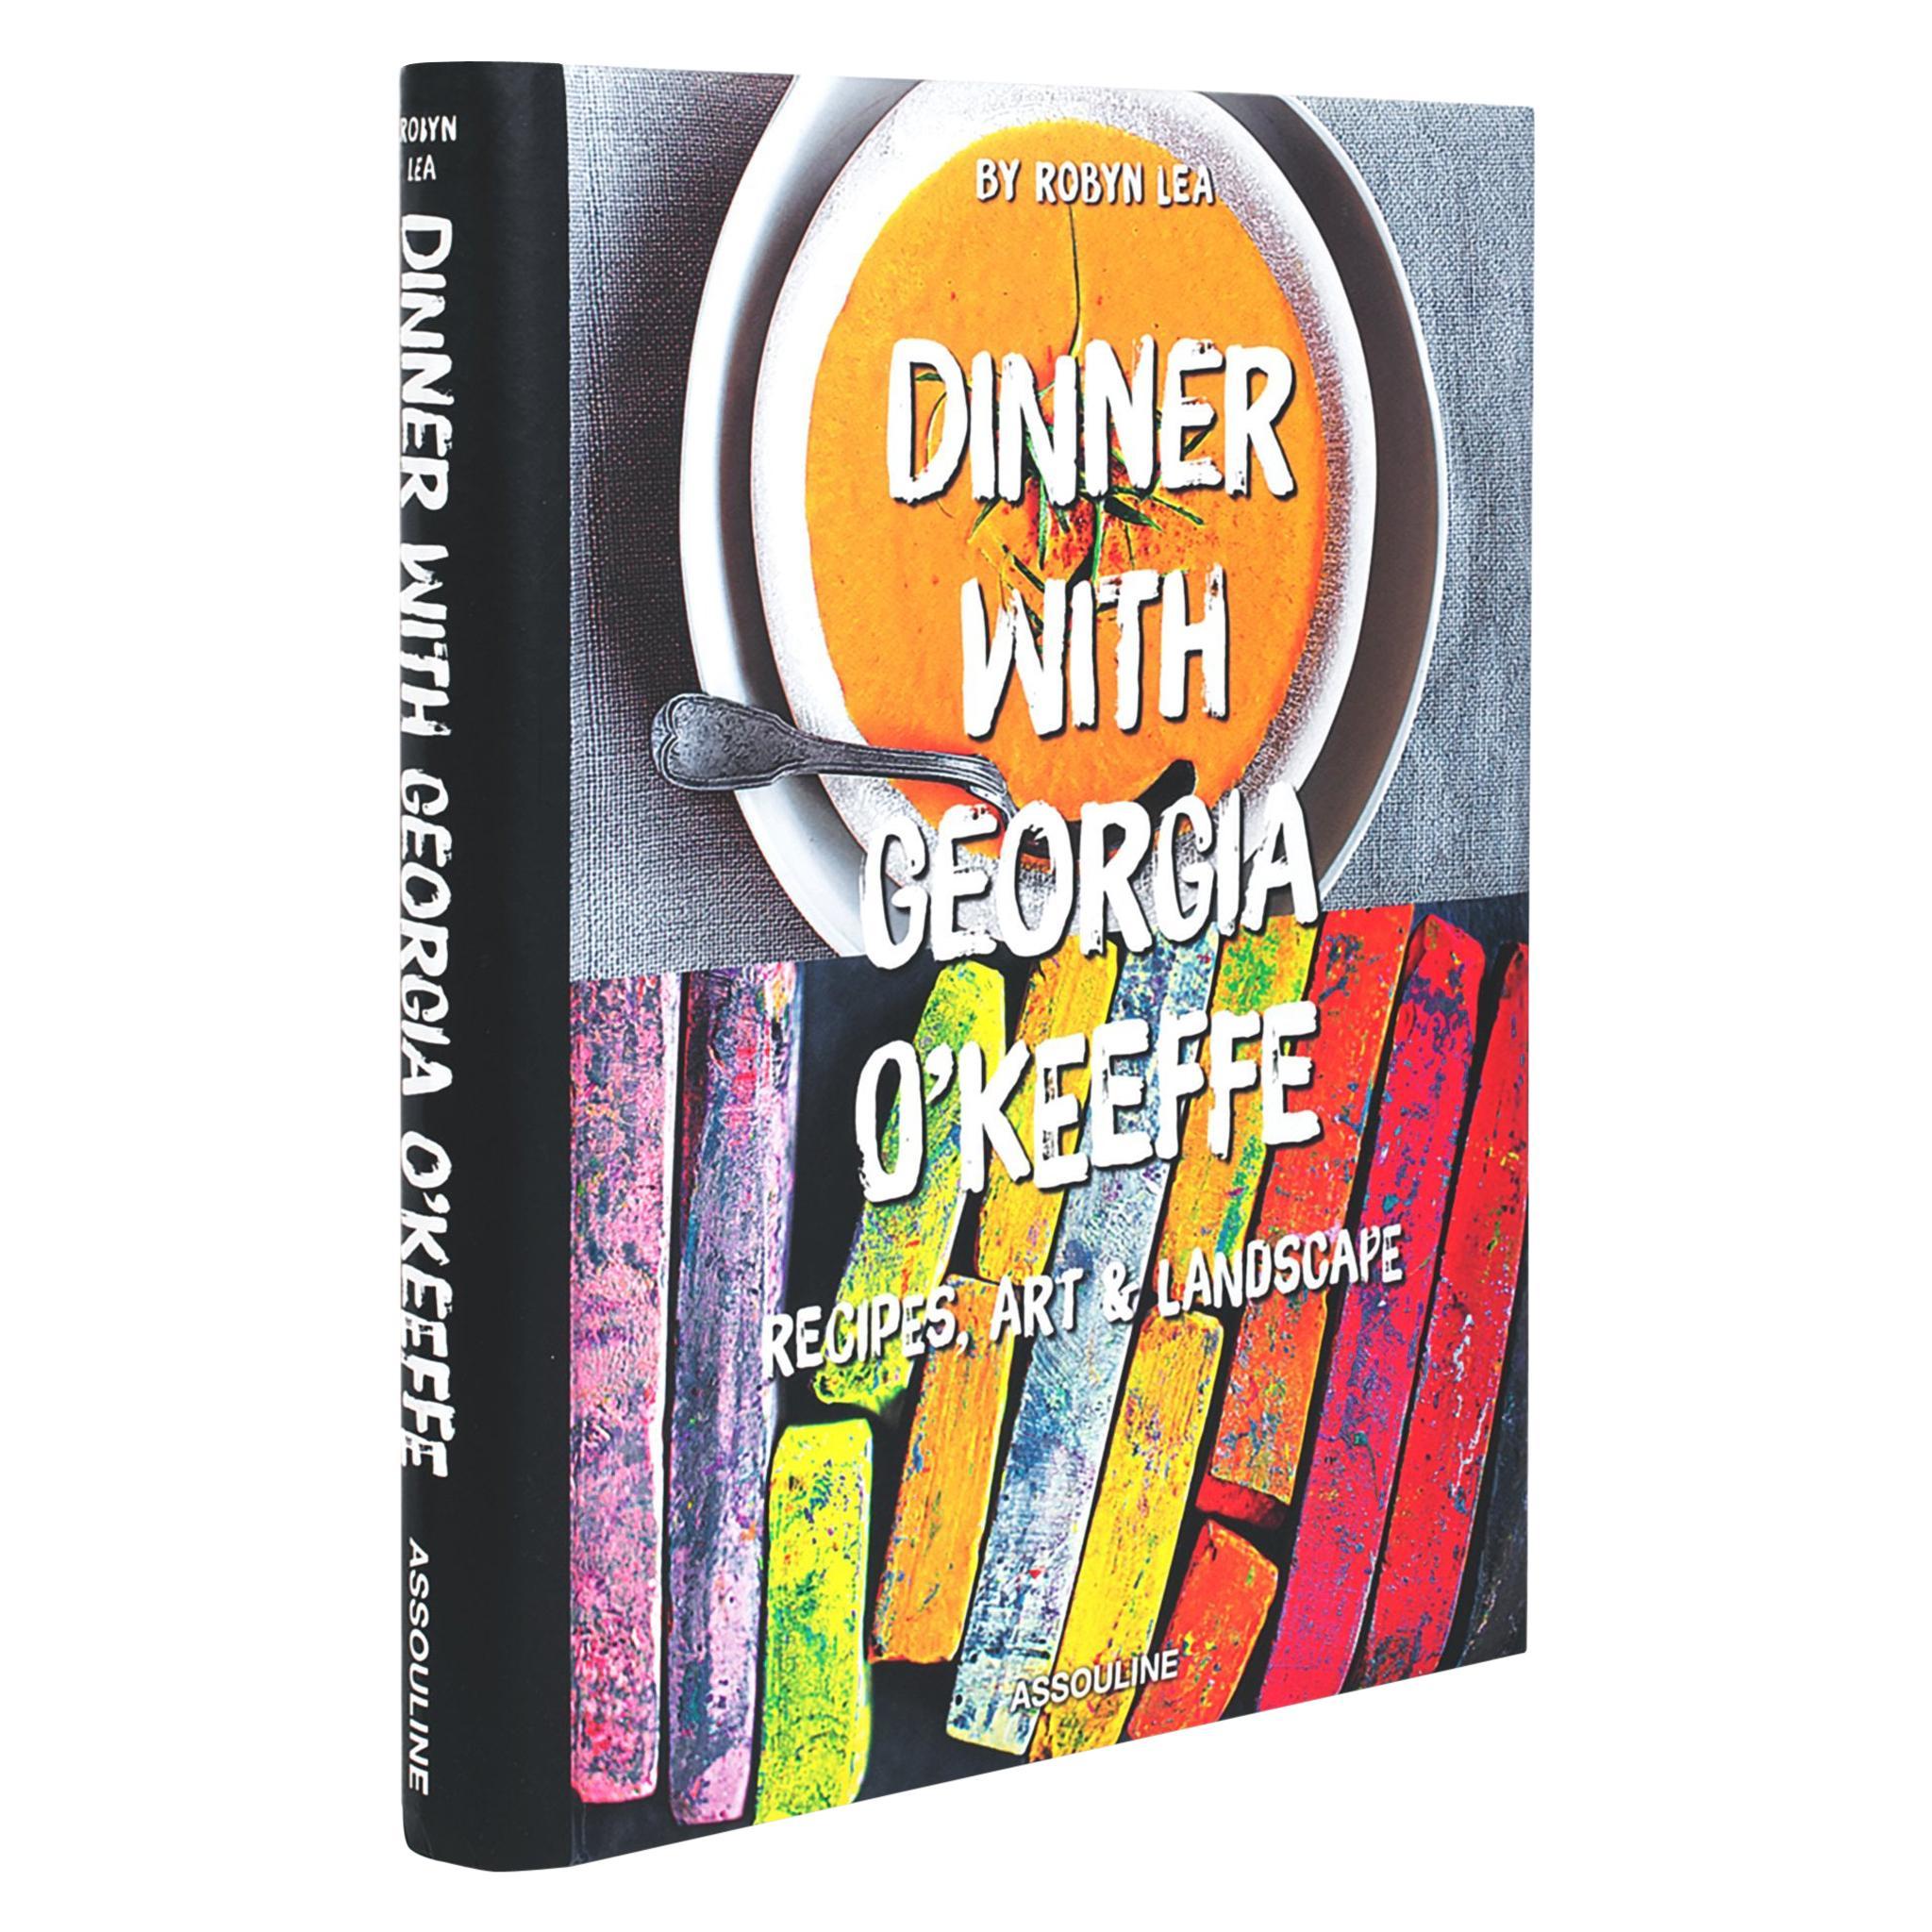 """Dinner with Georgia O'Keeffe"" Book"